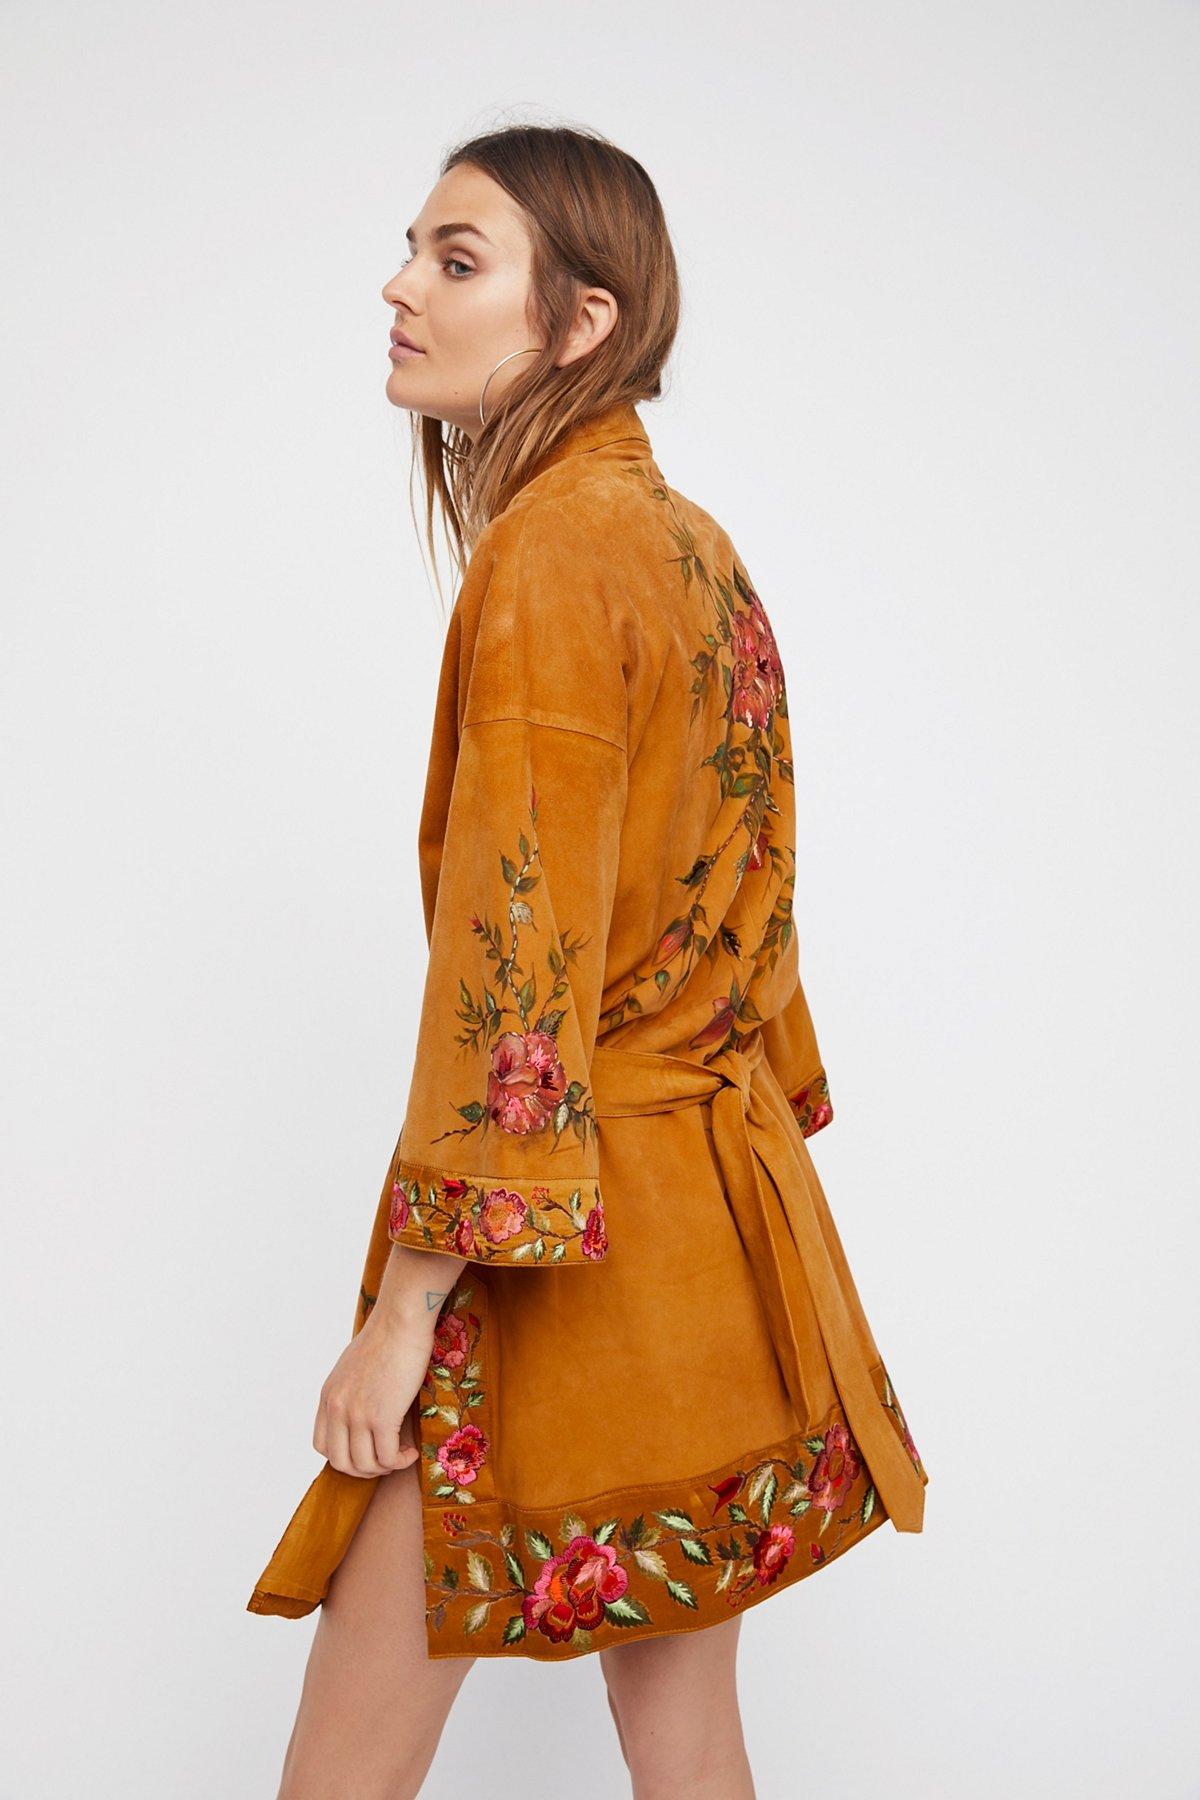 Floral Suede Kimono Jacket